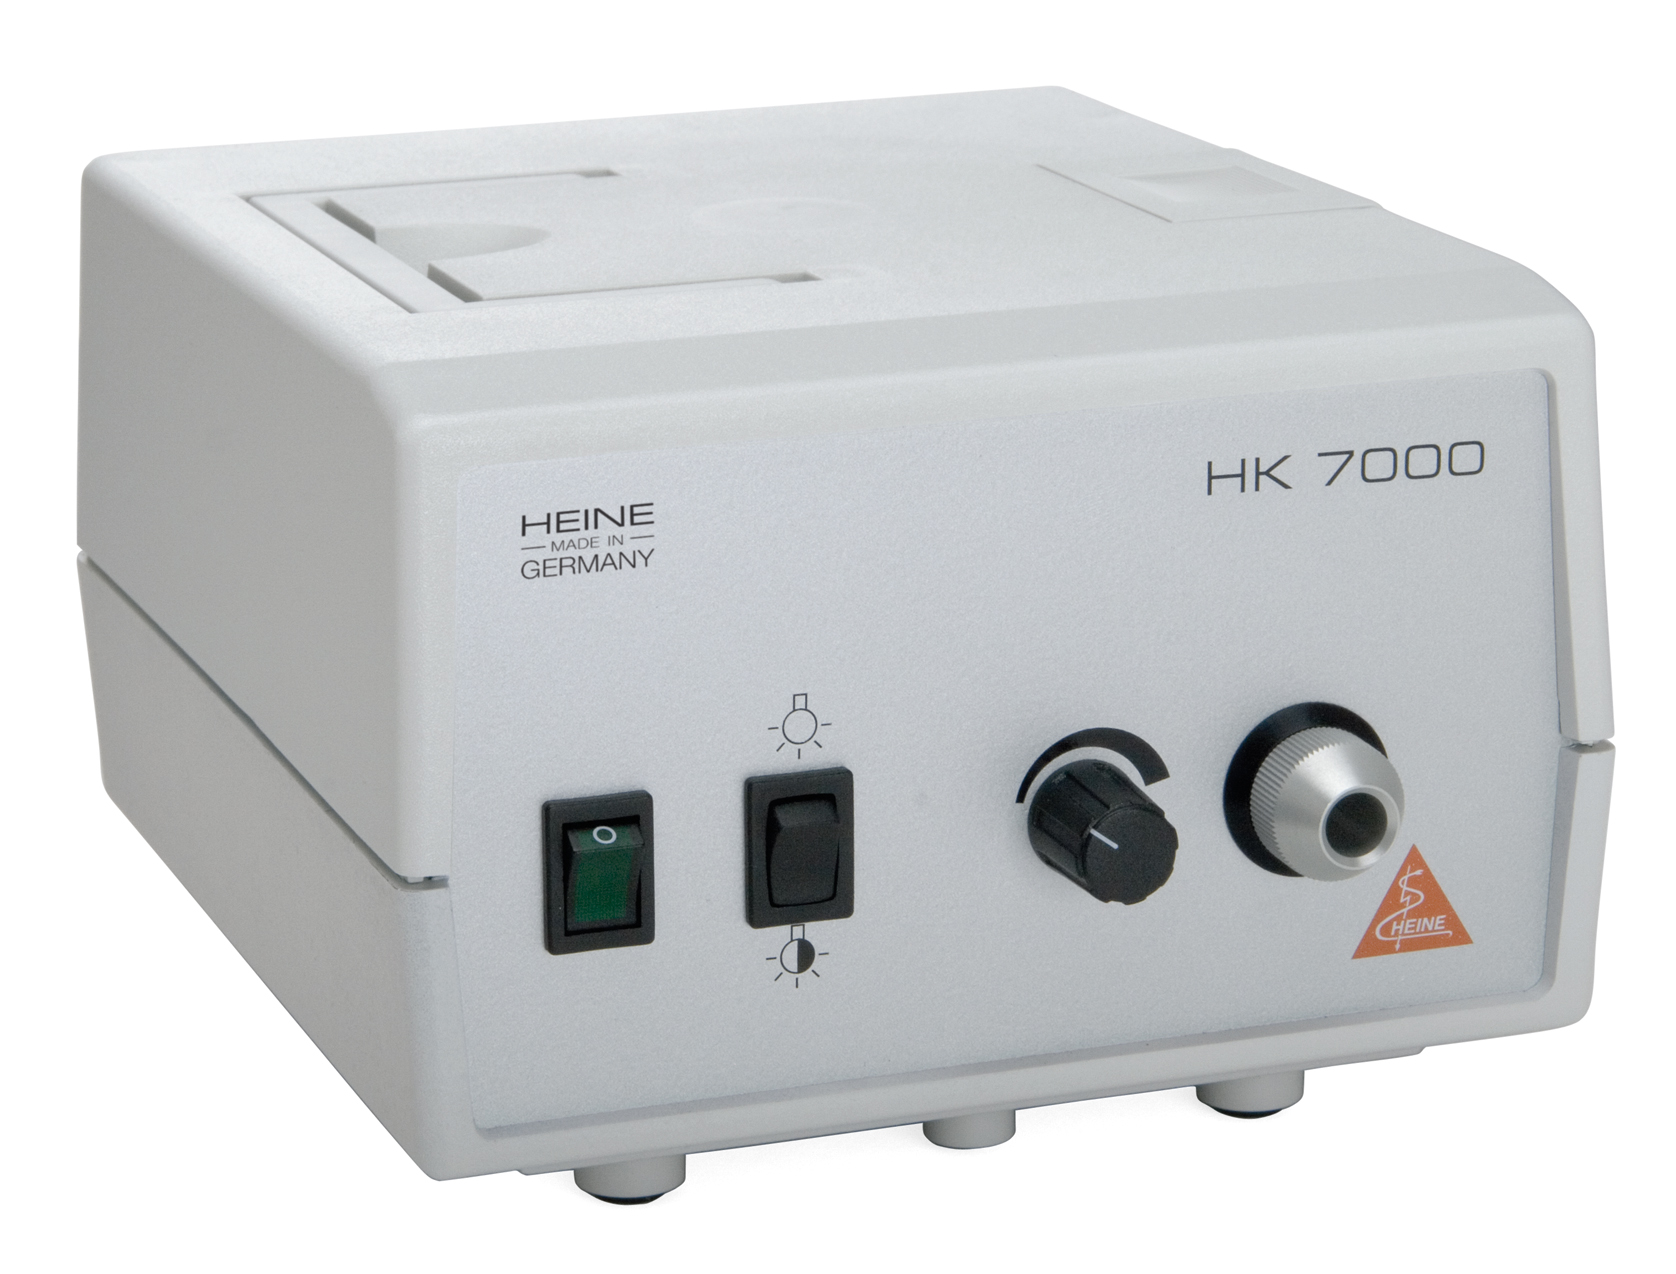 HK 7000 F.O. Projektor, inkl. 150 W XHL Halogen Lampe und, Sicherung